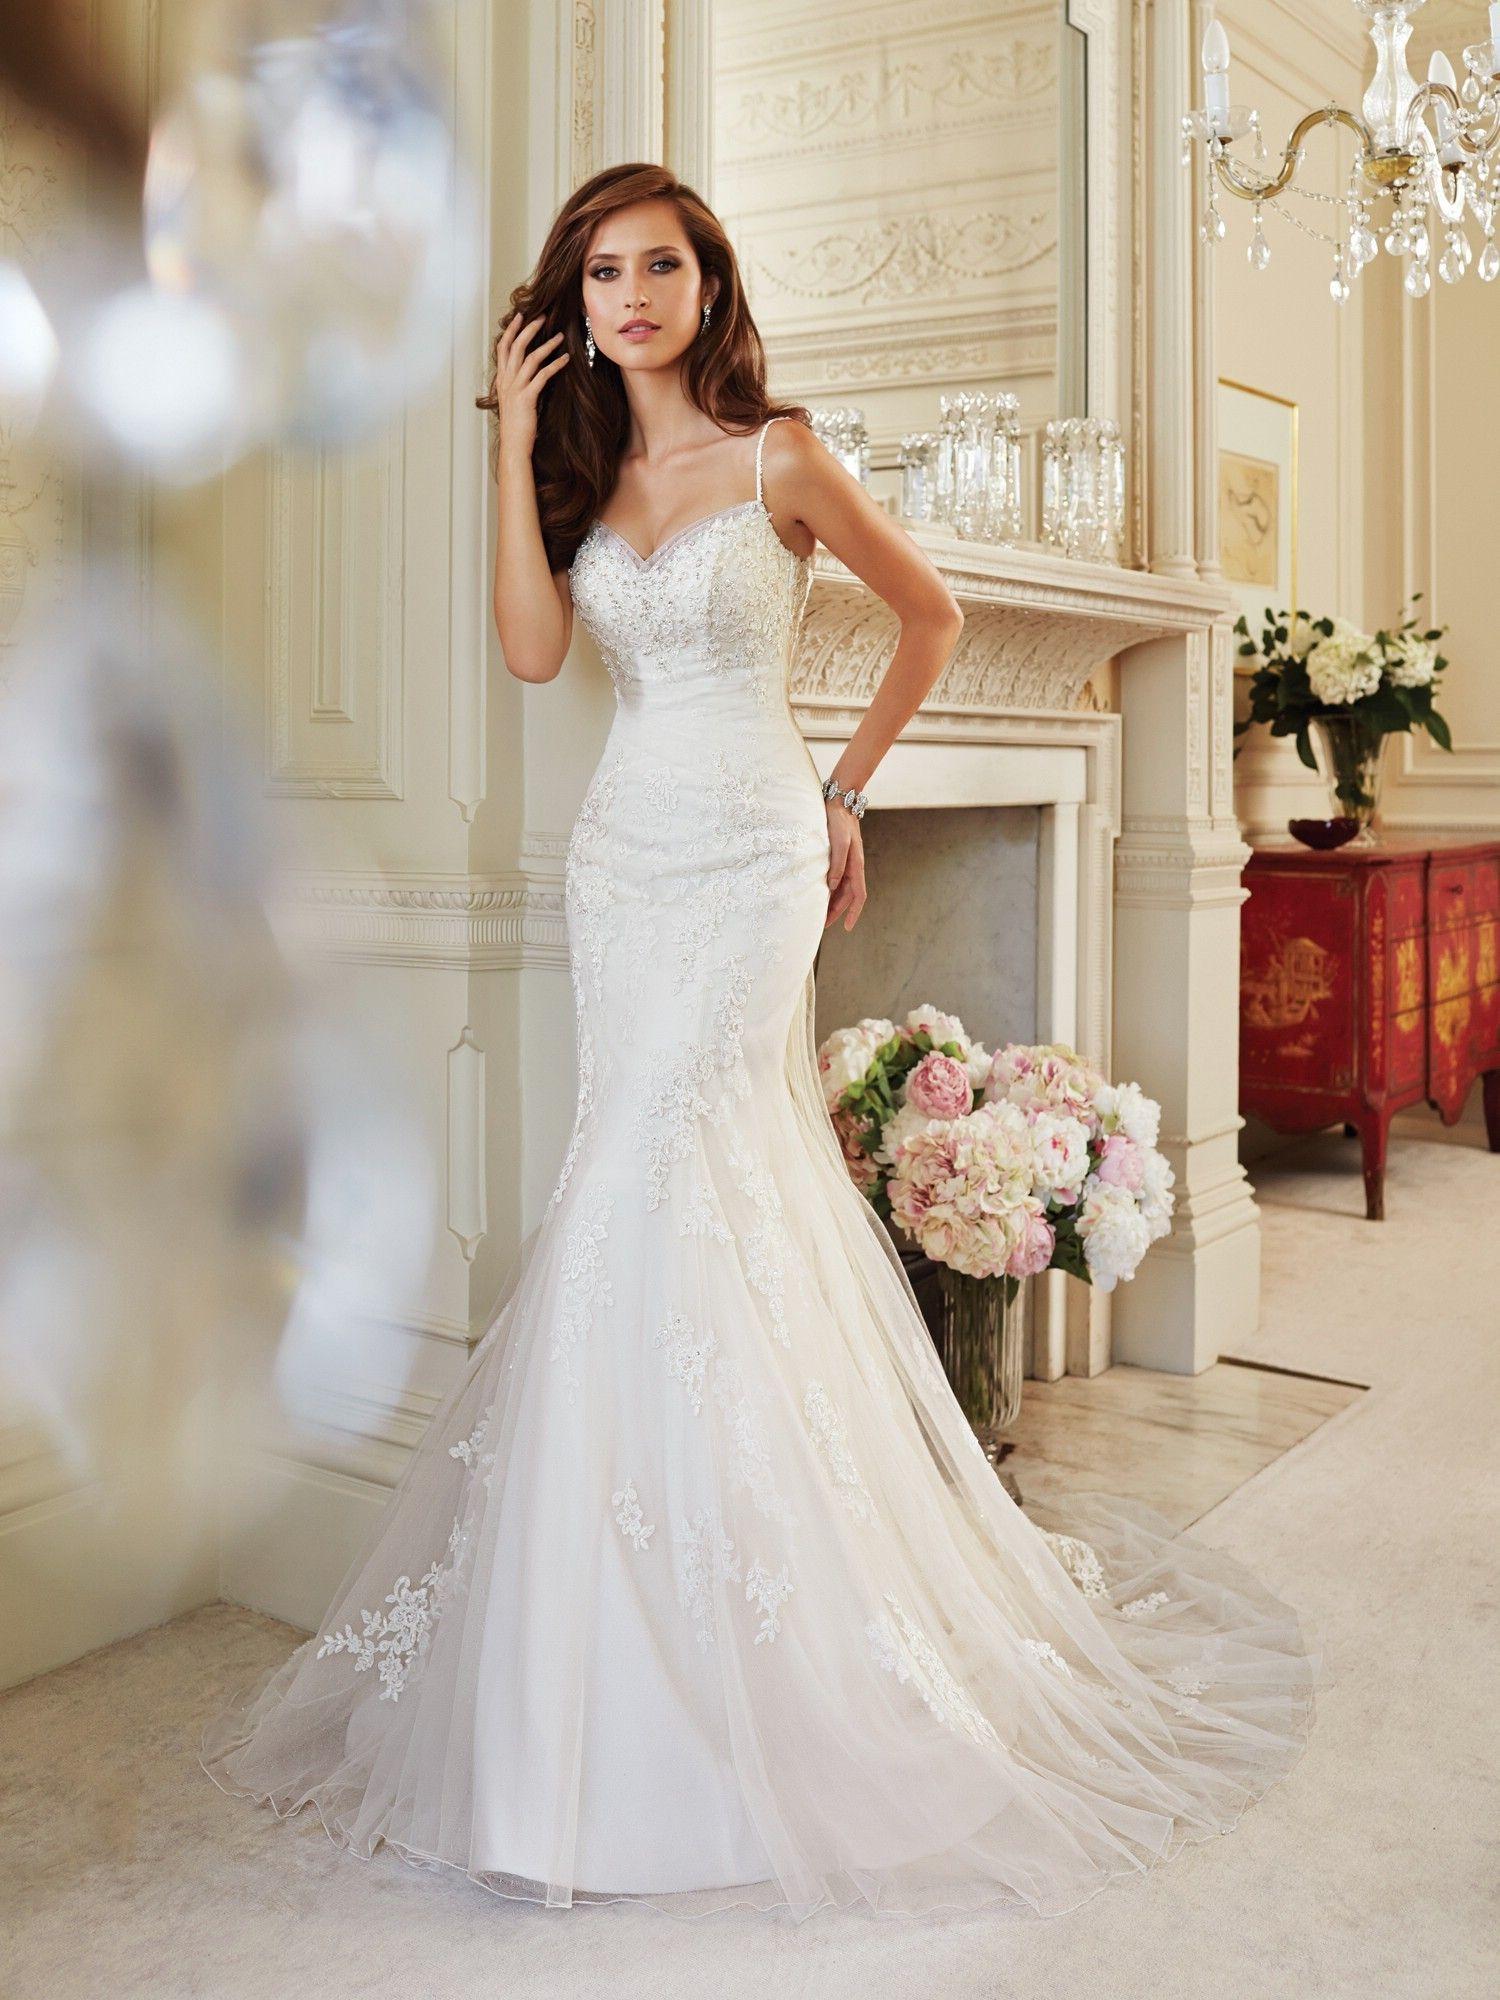 Sophia Tolli Wedding Dresses Style Cloris Y21444 1 573 00